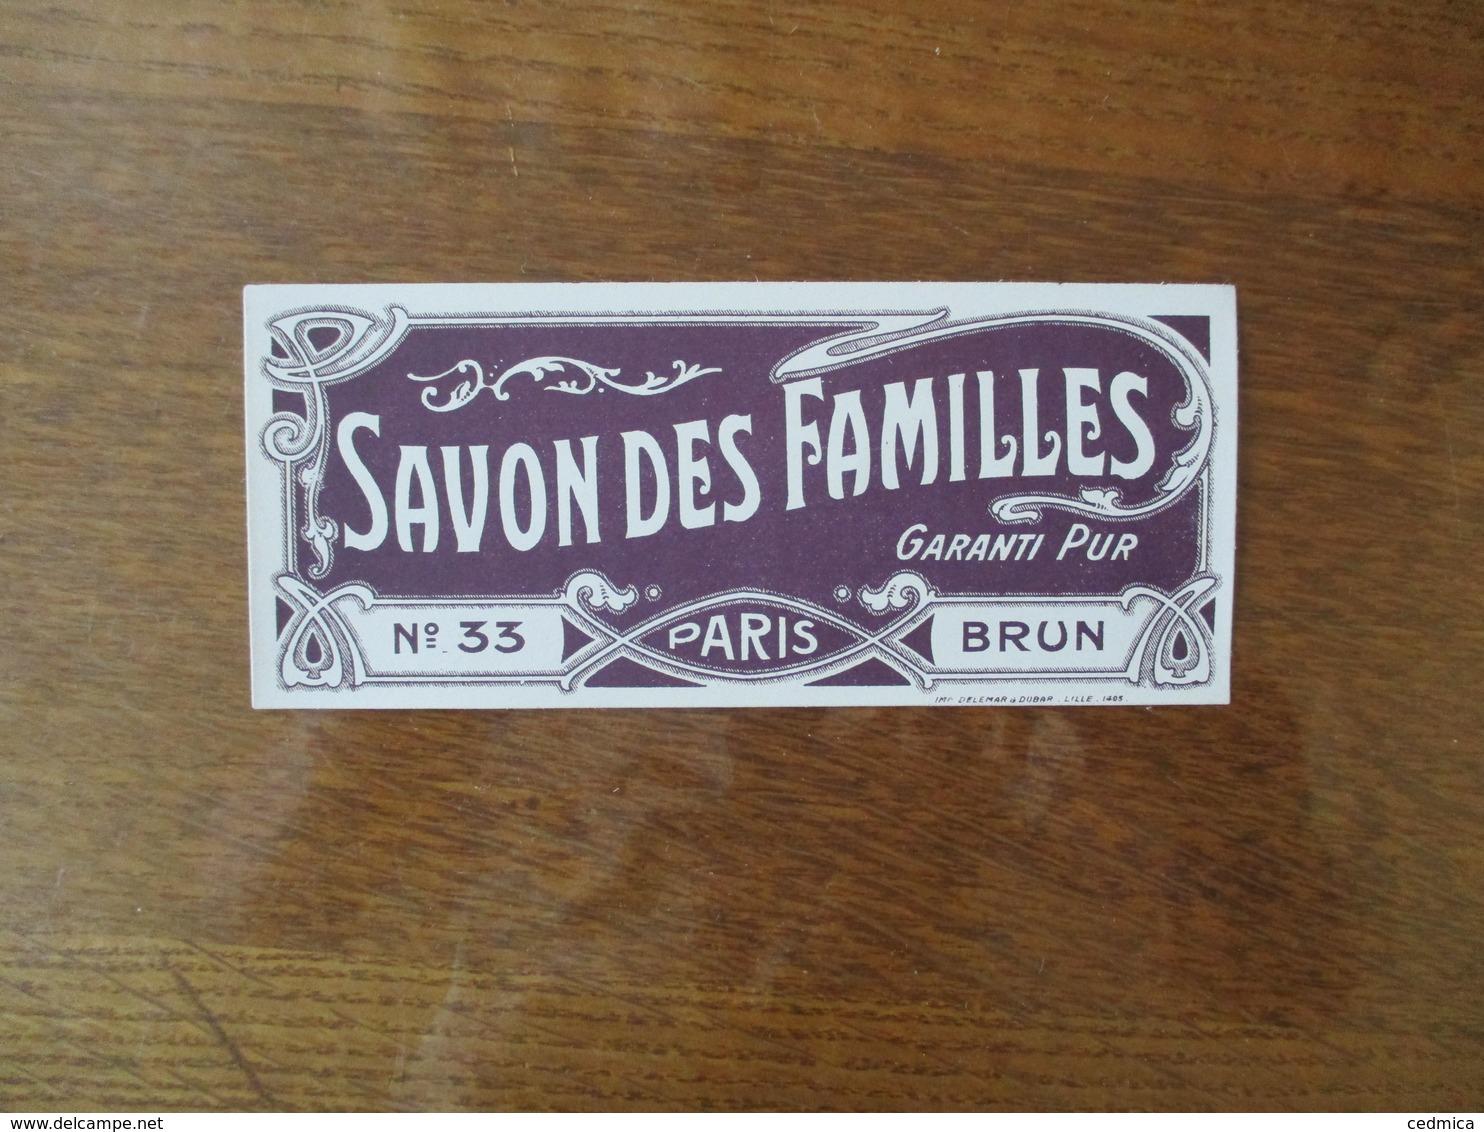 SAVON DES FAMILLES GARANTI PUR N° 33 PARIS BRUN - Etiquettes